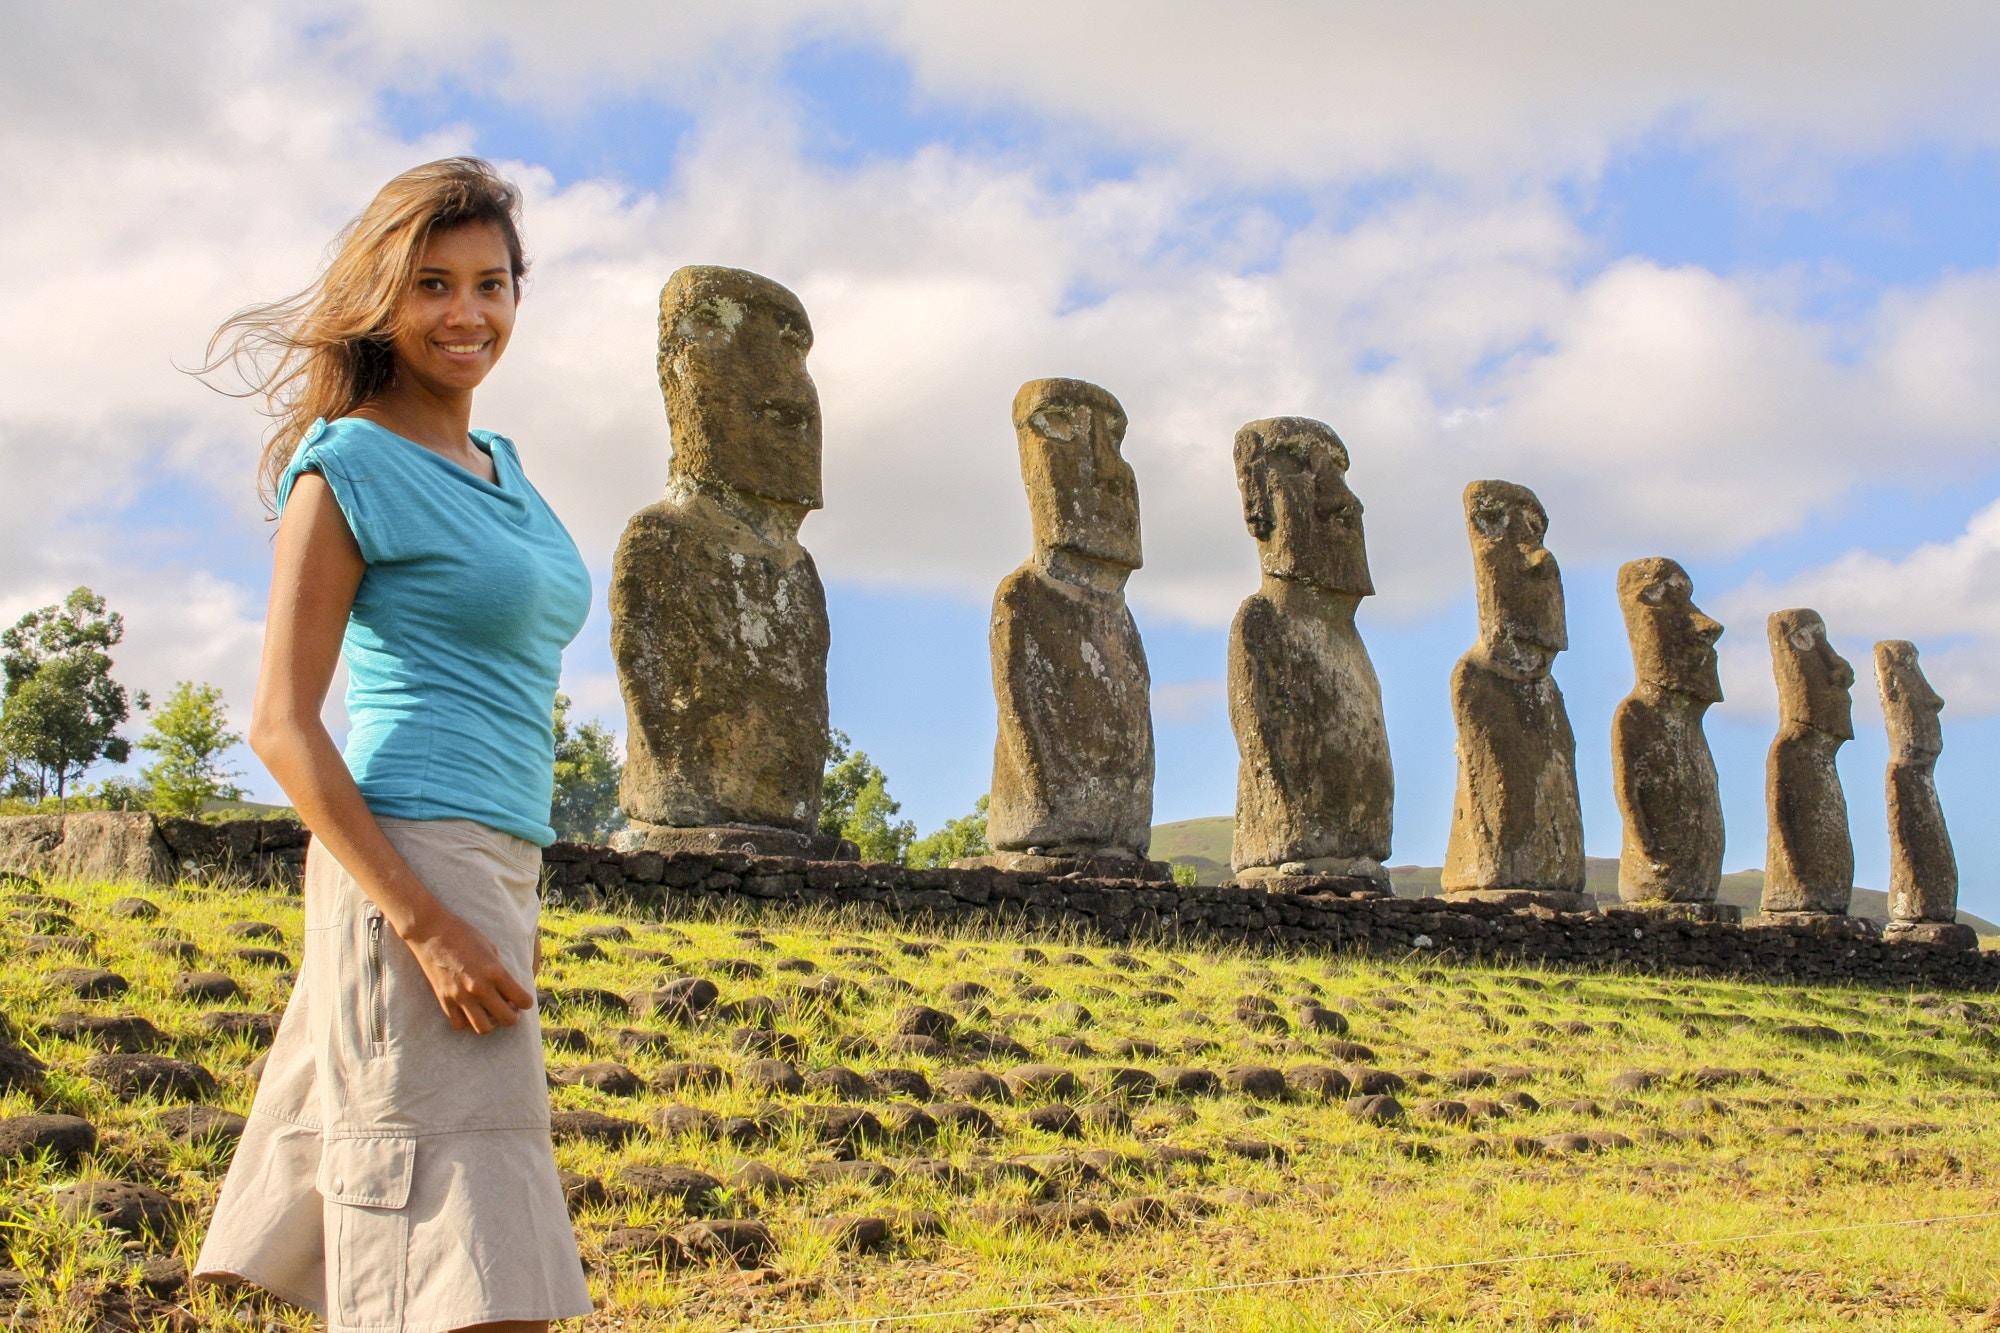 Kia Abdullah posing with the moai on Easter Island